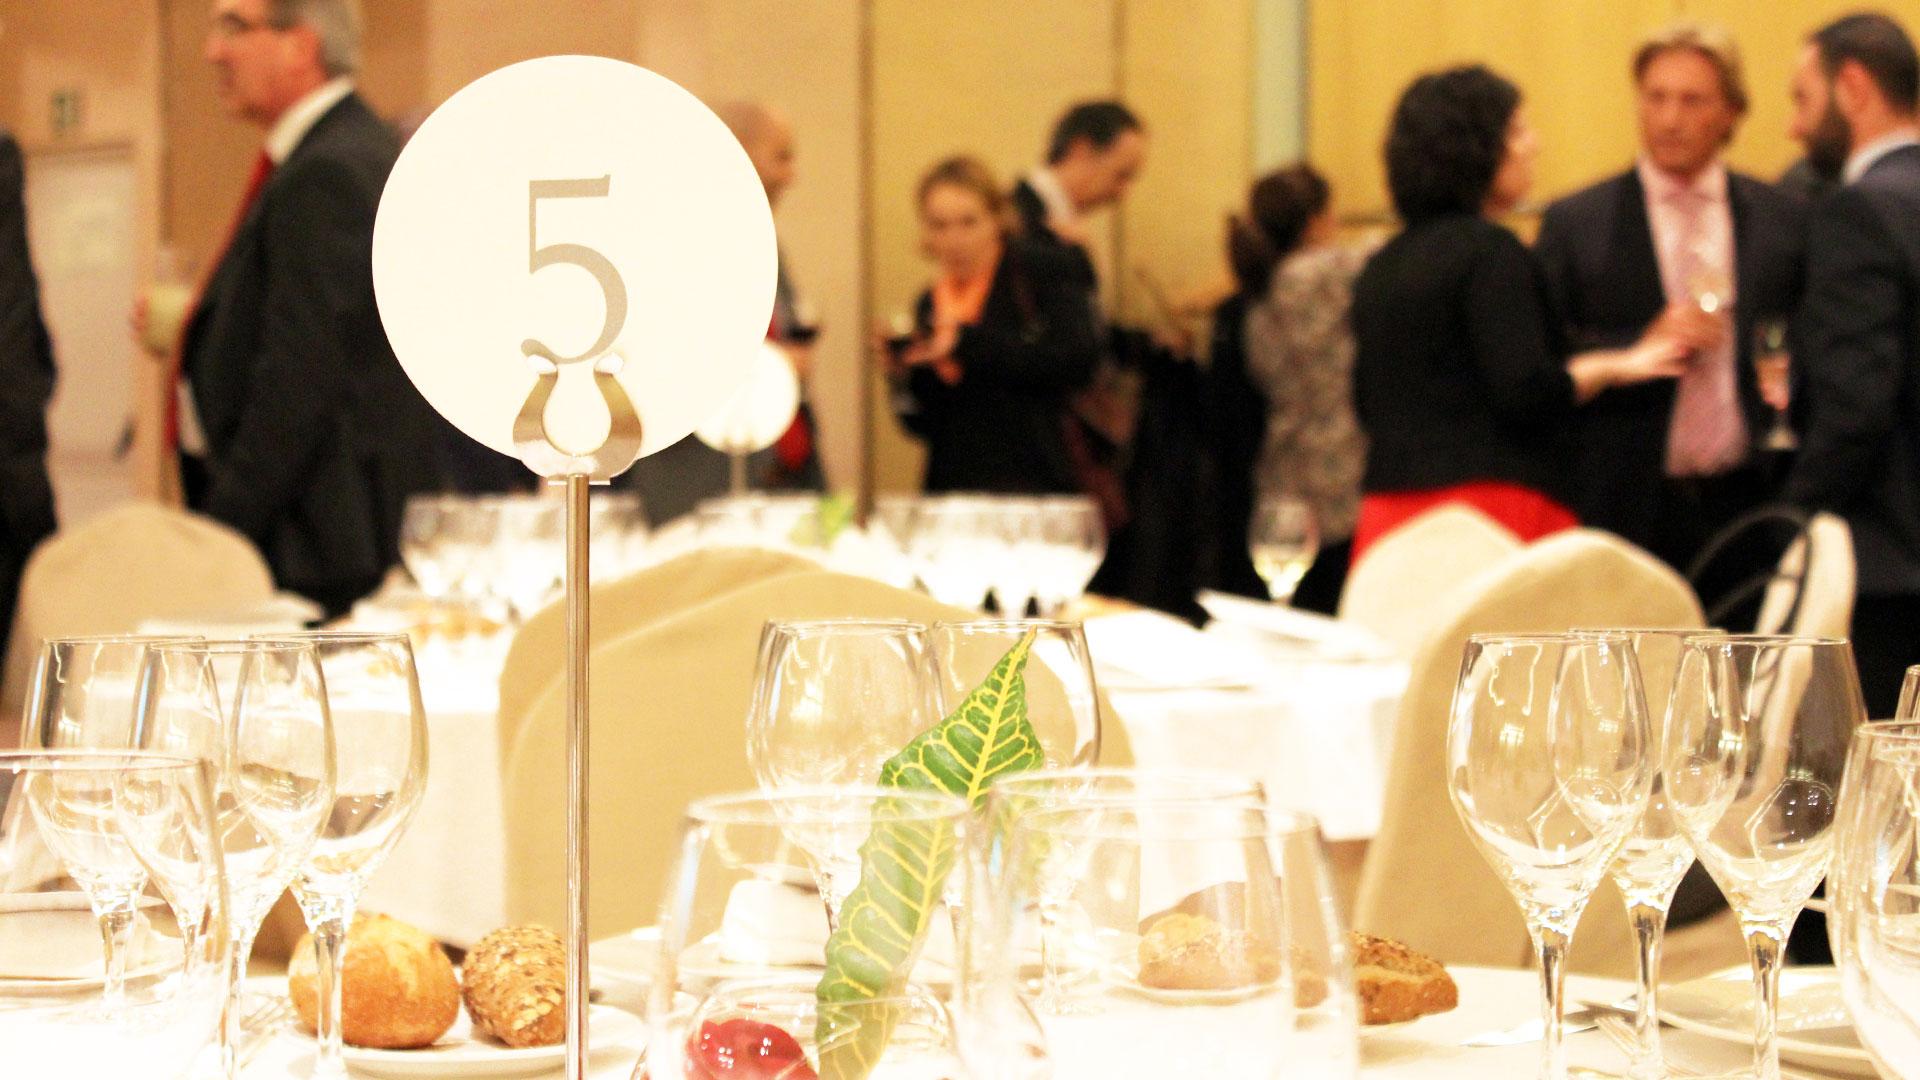 premios-mc2015-evento-comida-hotel-hesperia-mesa-numero